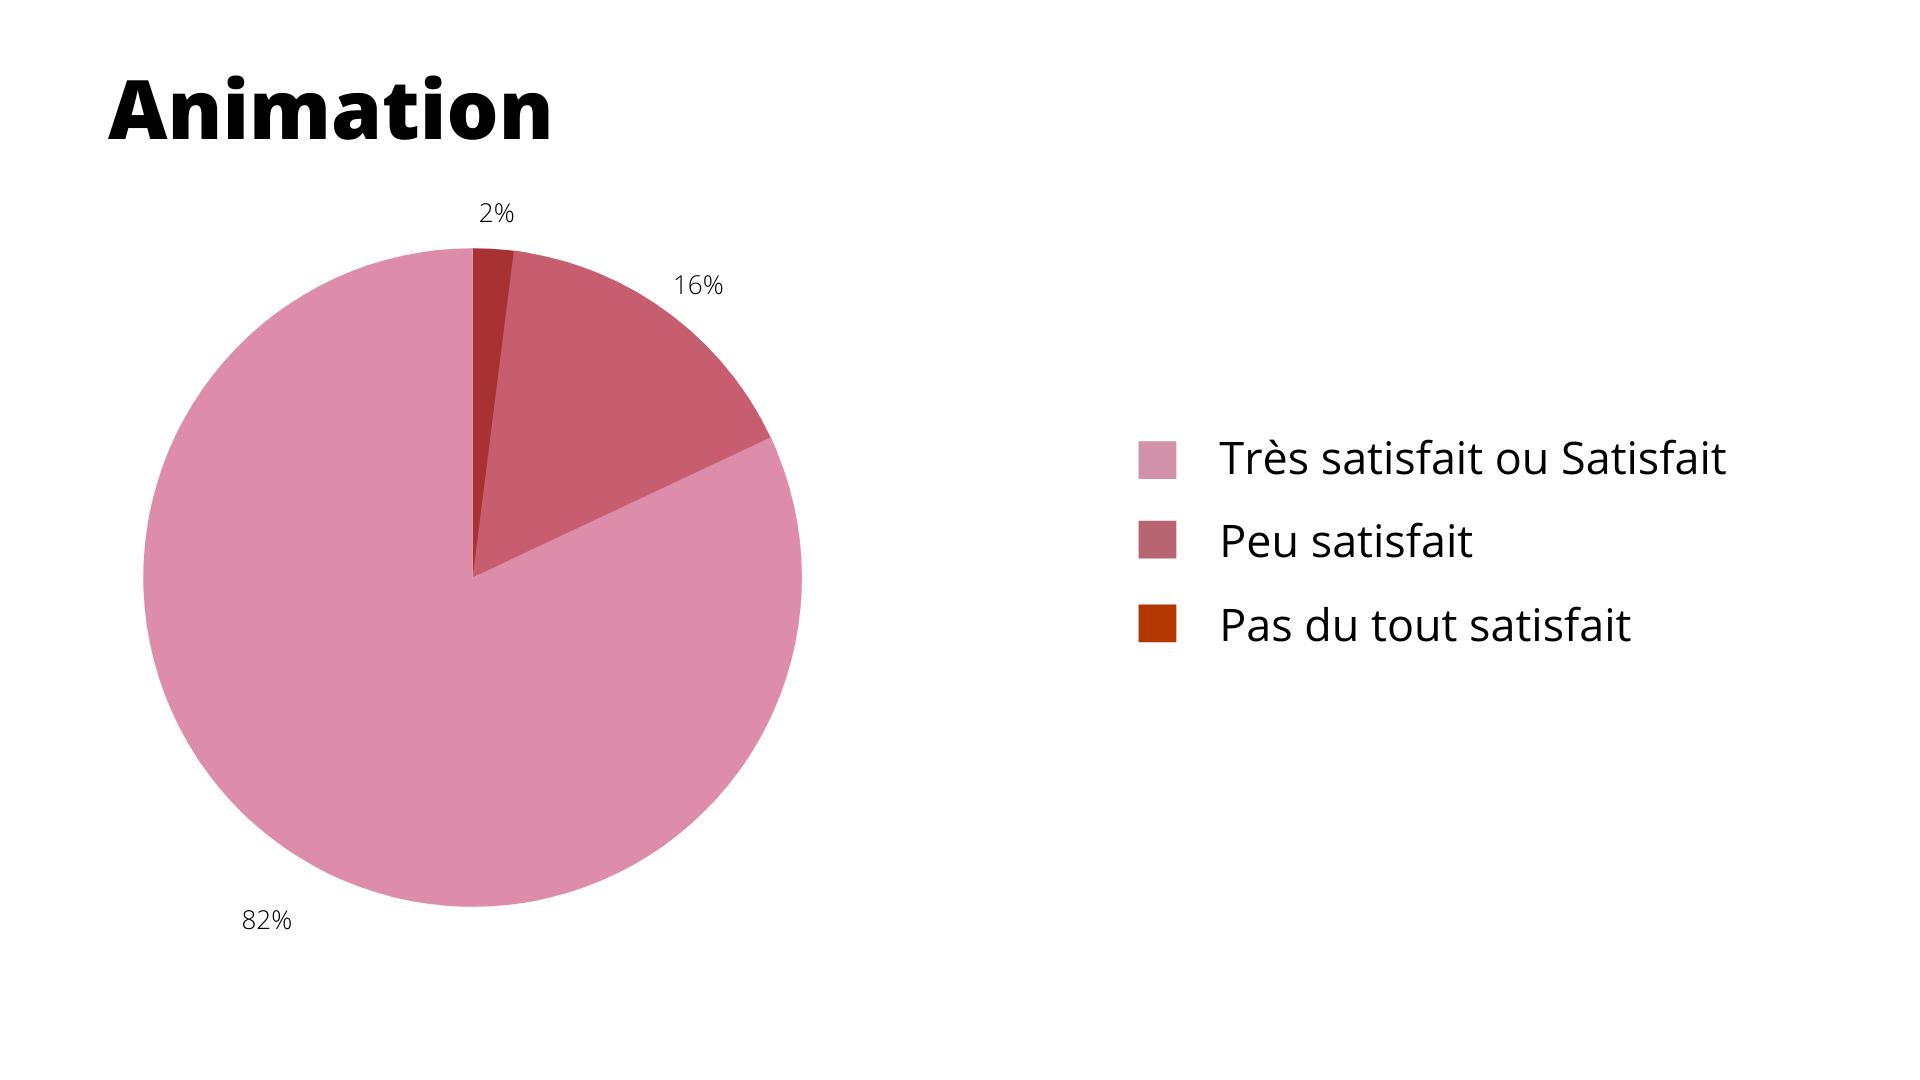 Résultat : Animation